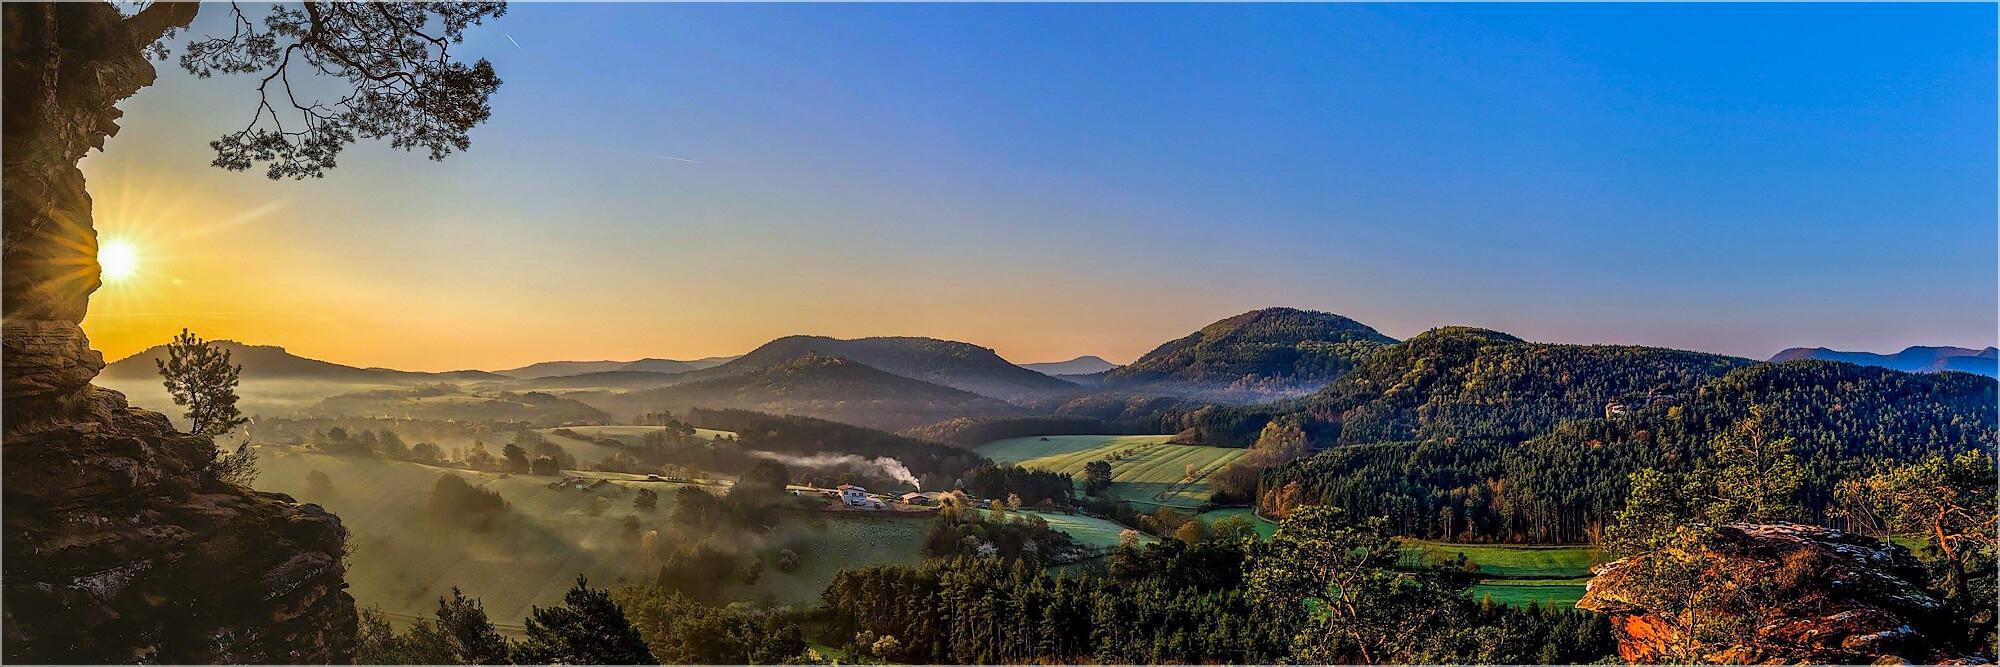 Panoramabild Busenberg am Dickenbergturm Pfalz